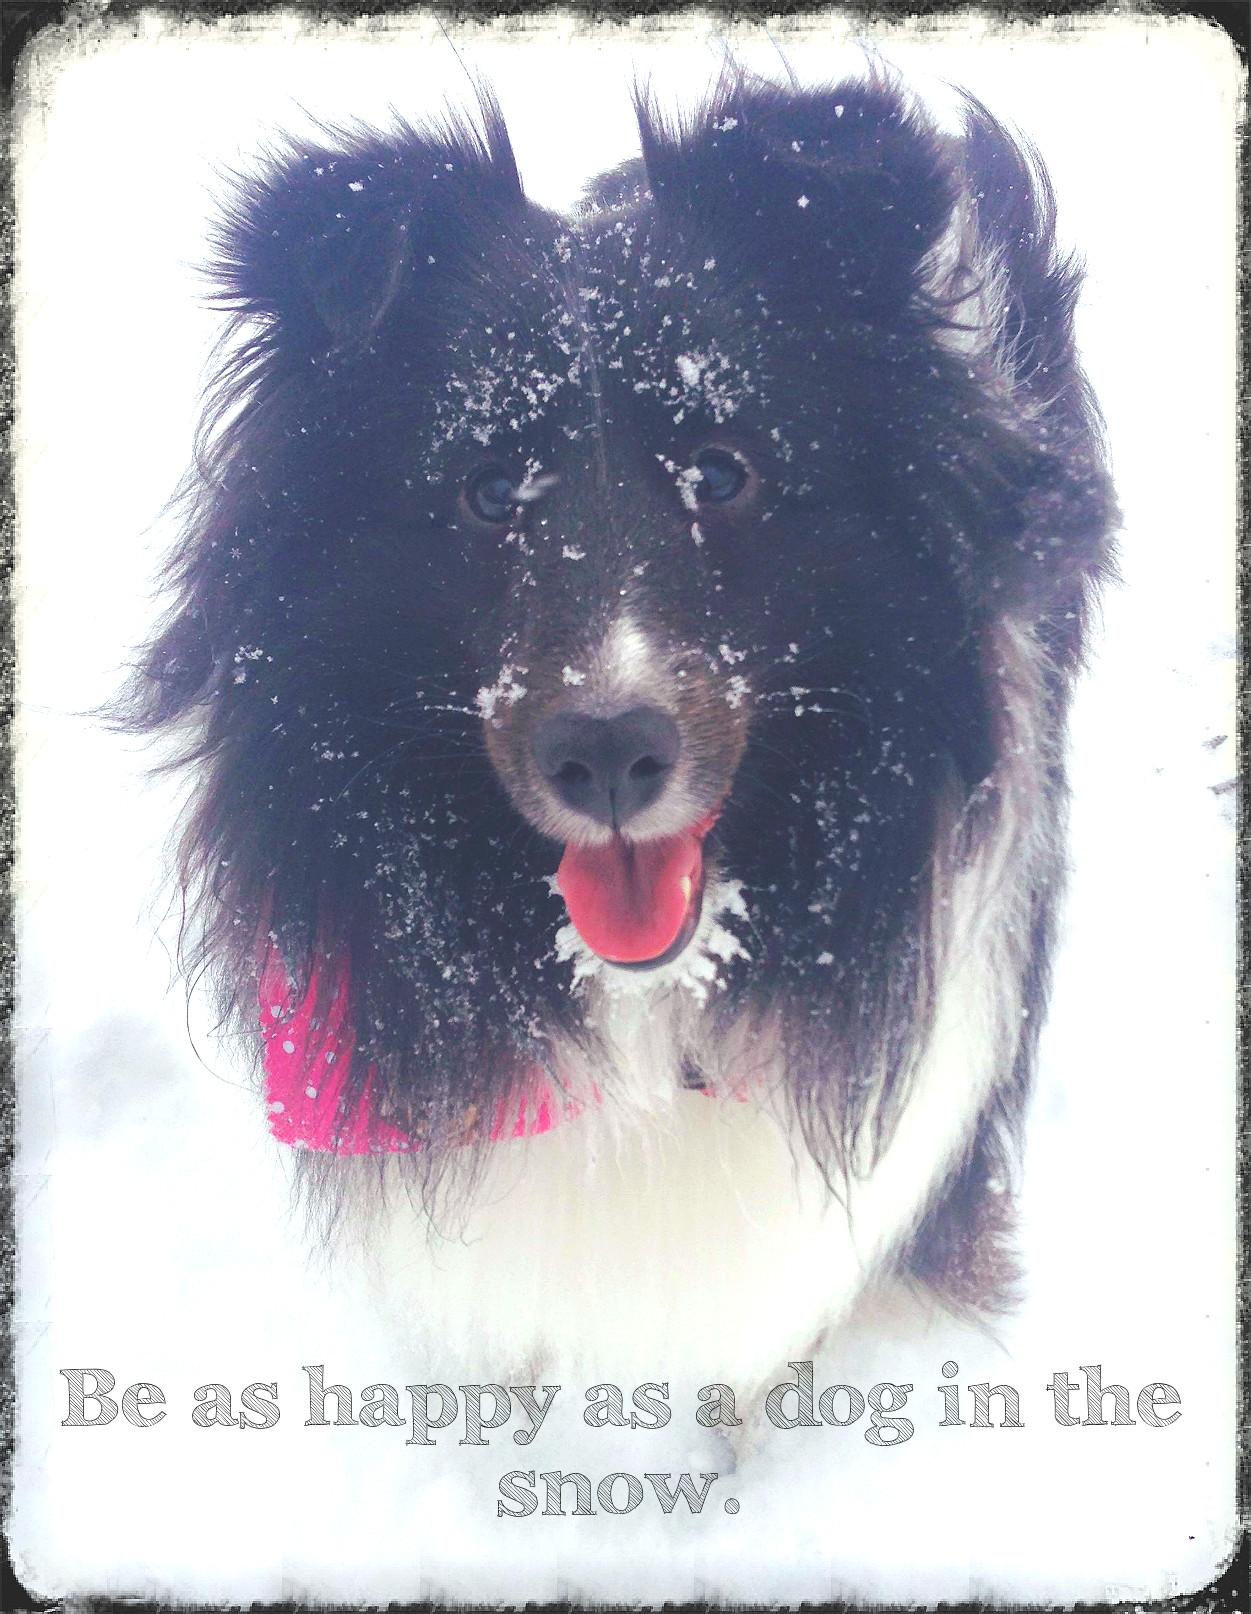 Sophie the Snow Dog